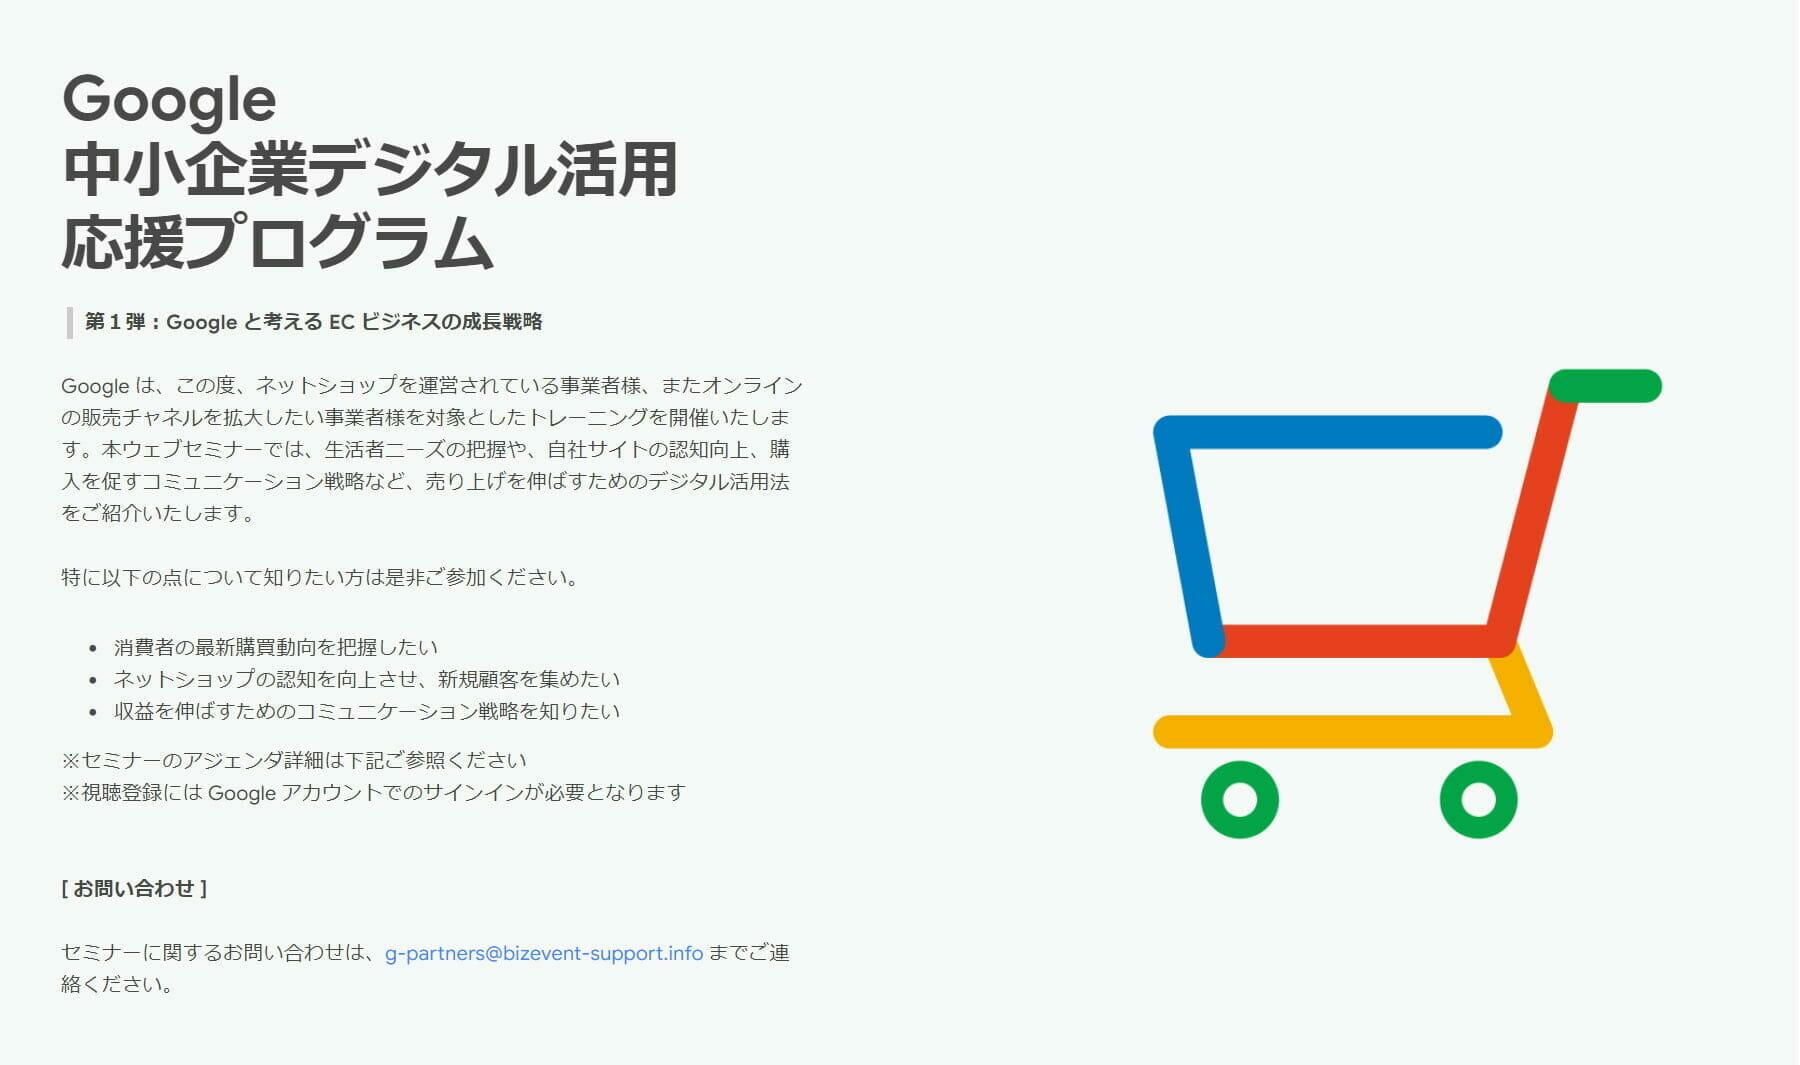 Google 中小企業デジタル活用 応援プログラム〜第1弾:Google と考える EC ビジネスの成長戦略